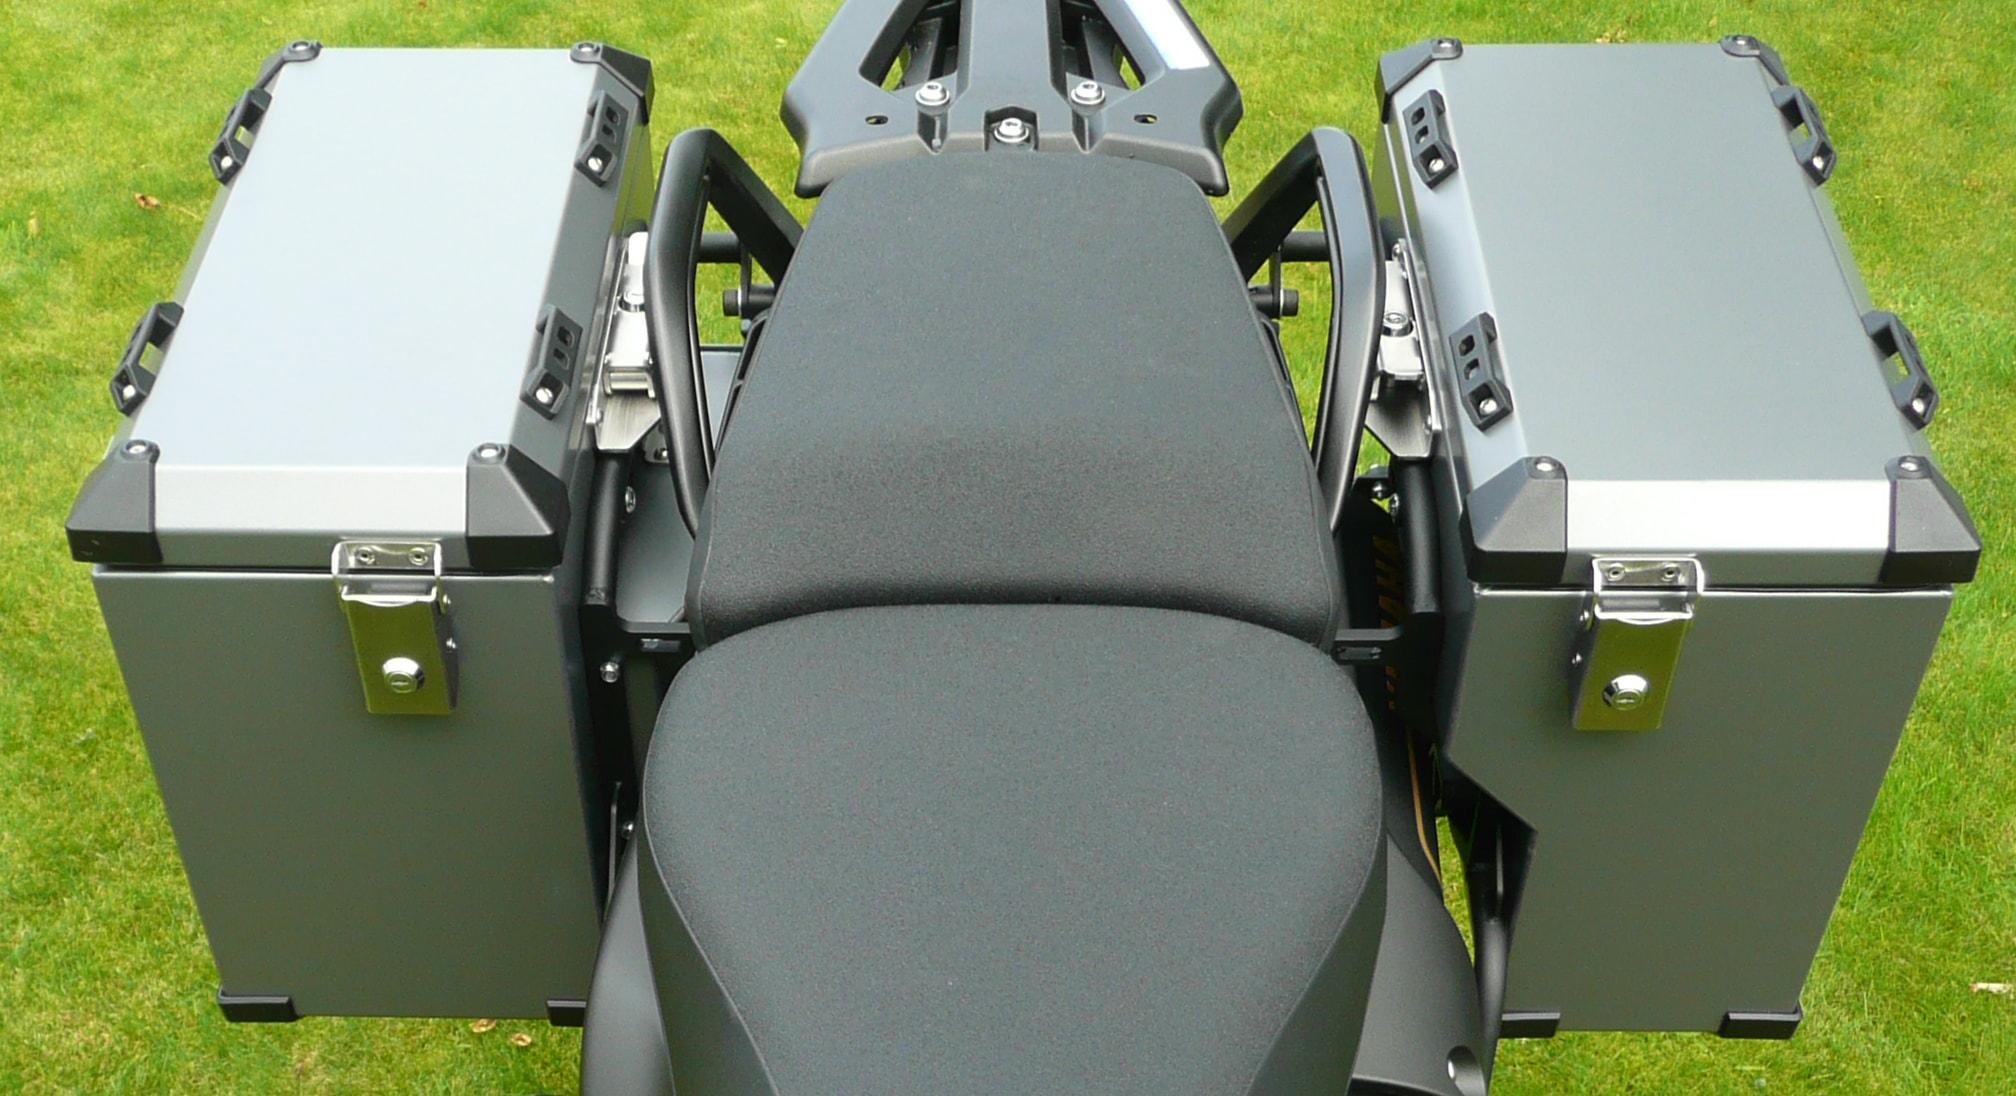 Defender panniers system